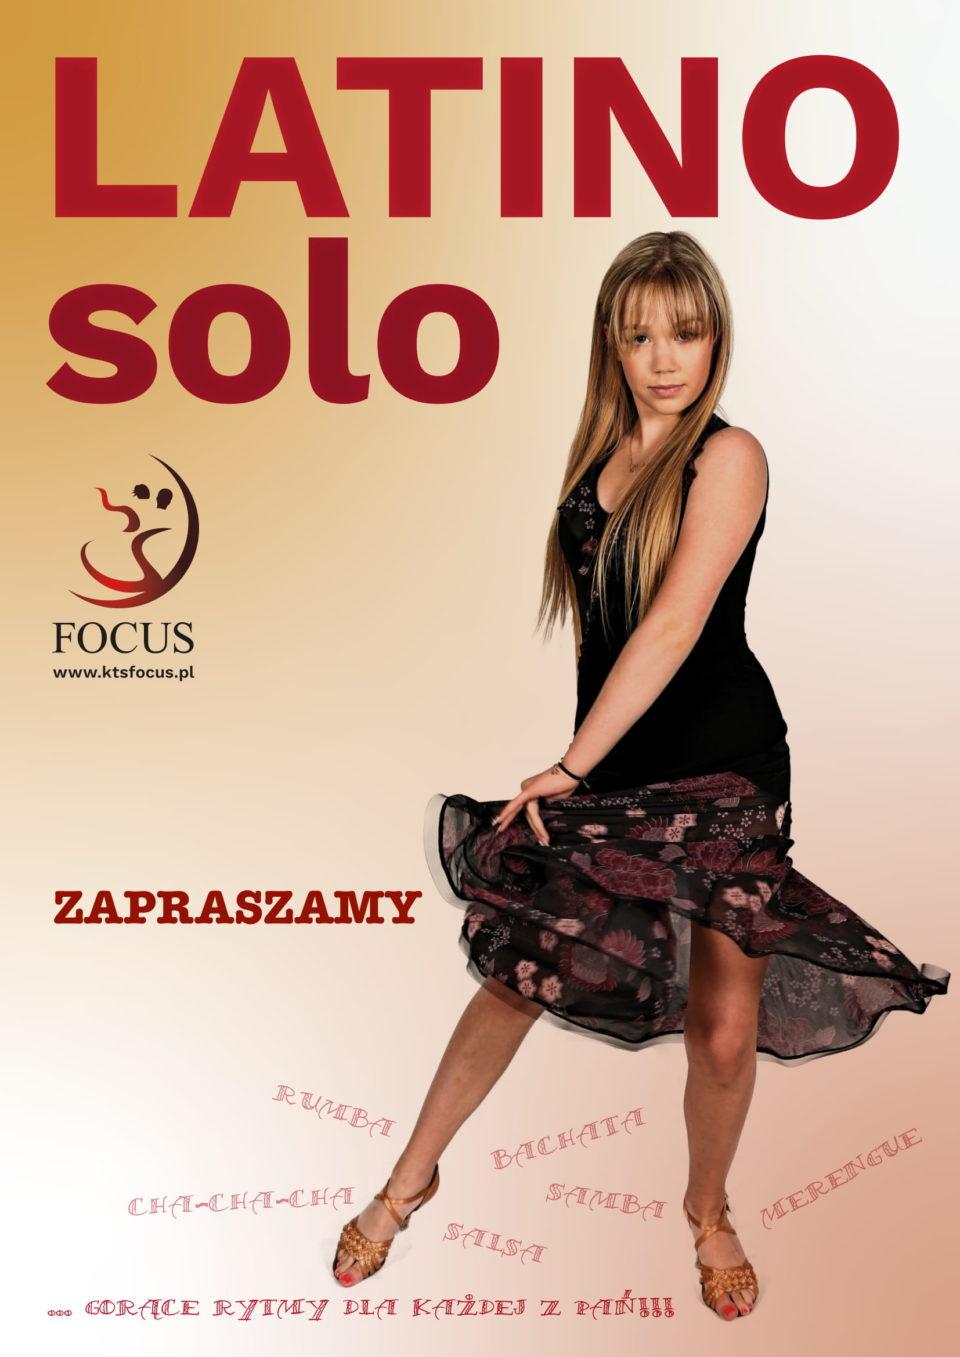 kts focus latino solo plakat ogólny-1